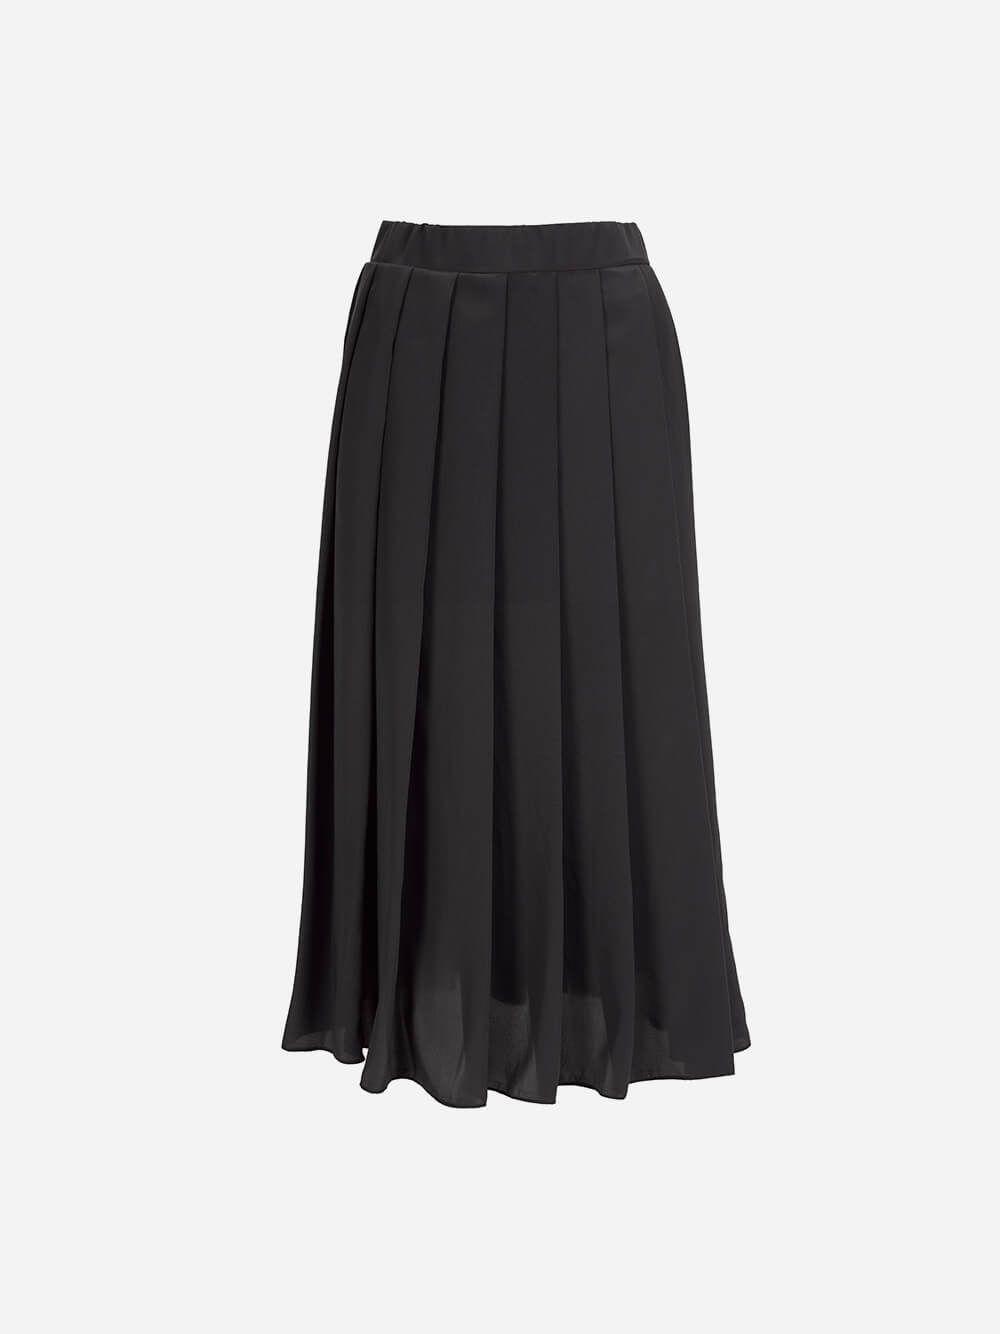 Black Skirt | Mauî